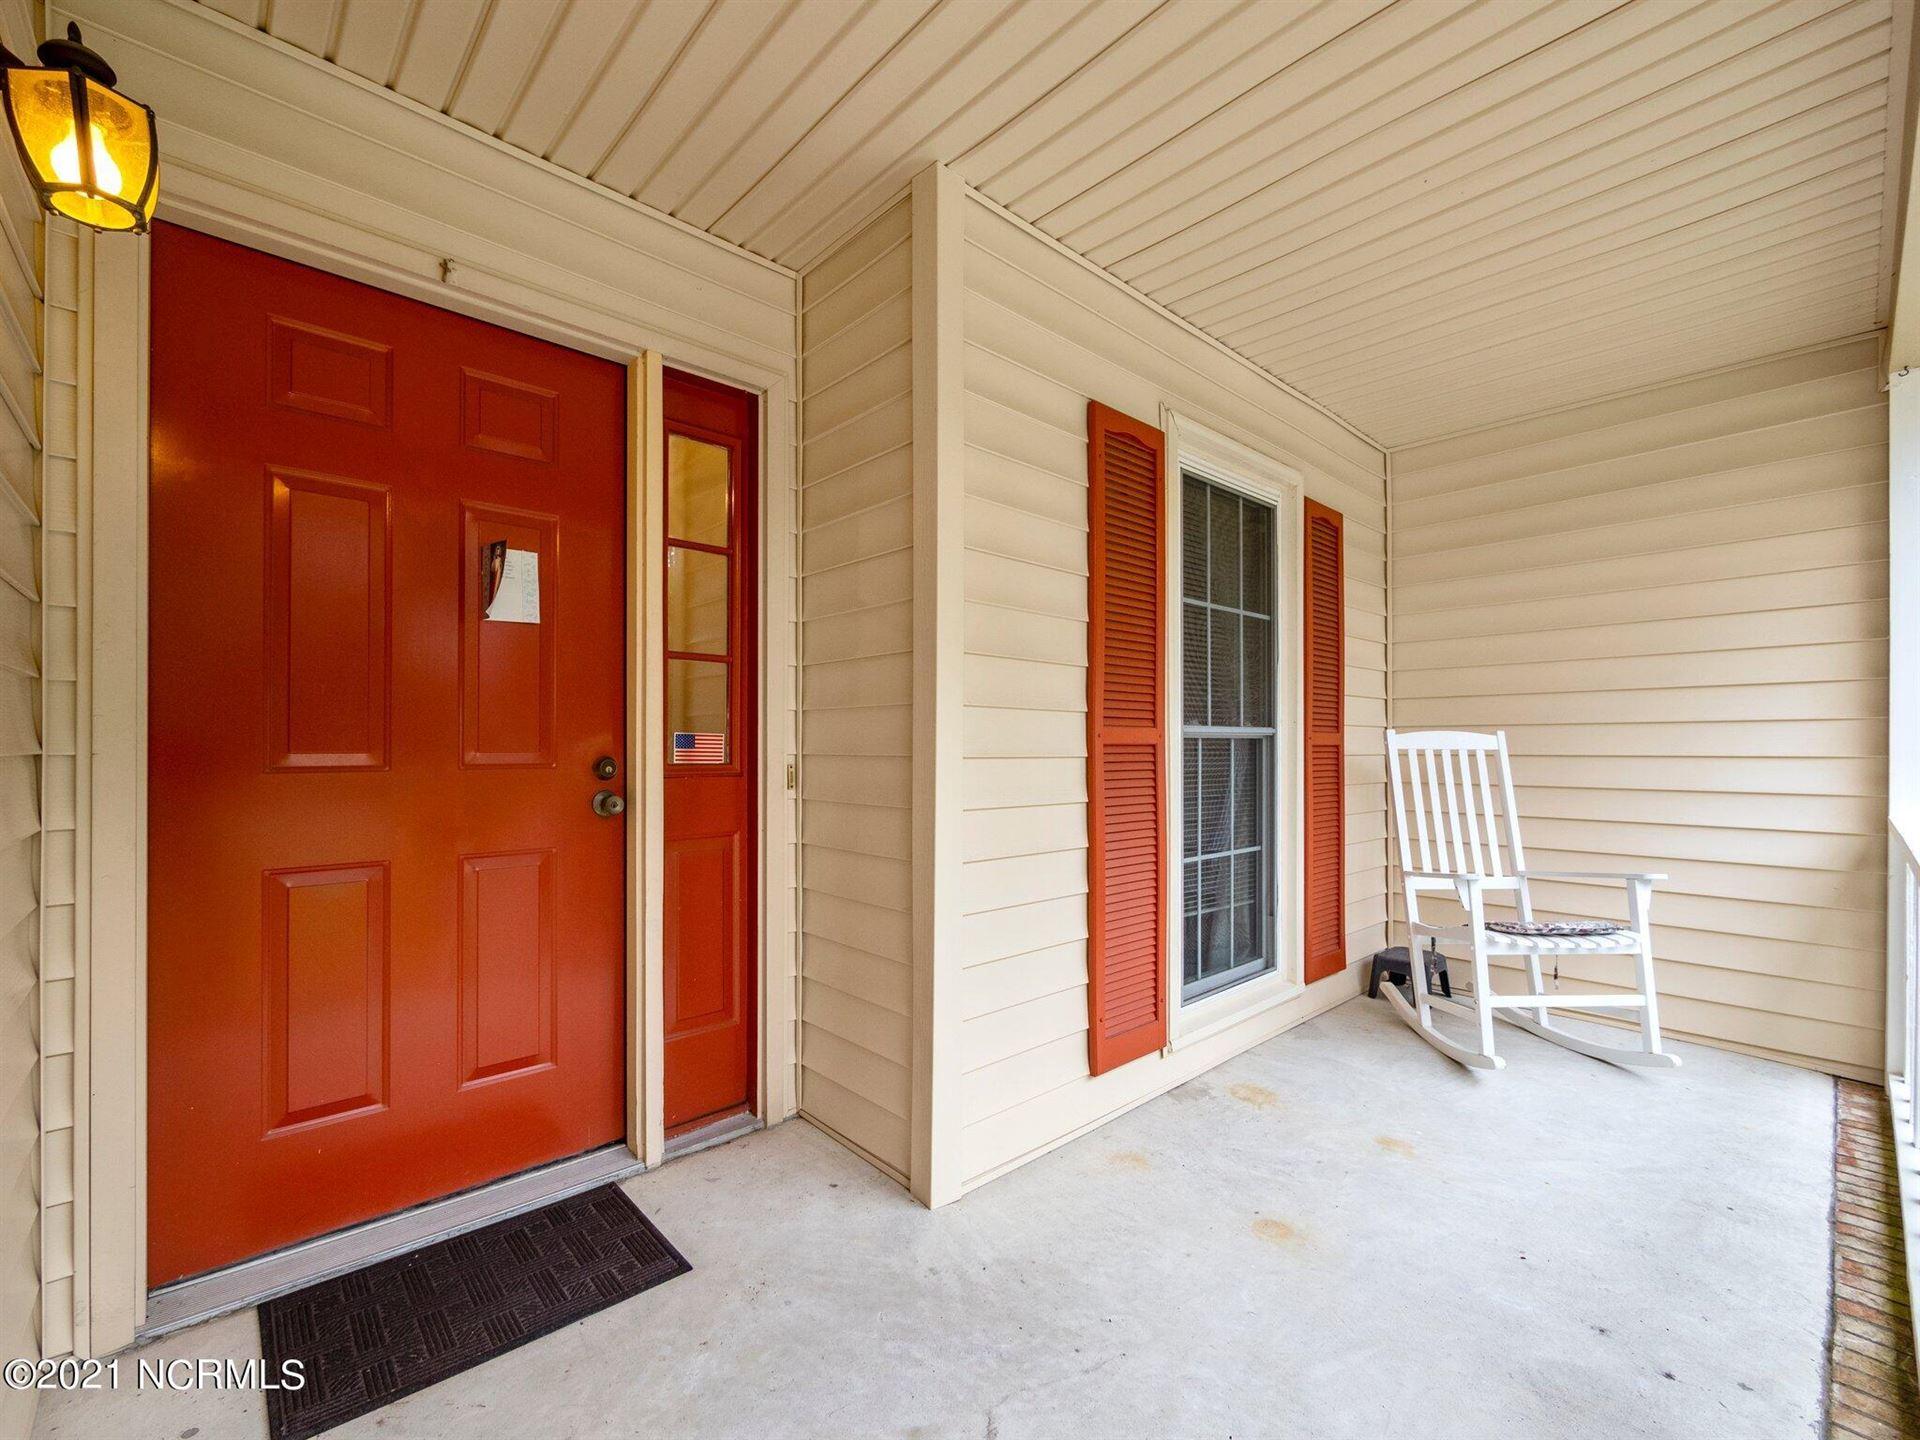 Photo of 6218 Cardinal Drive, New Bern, NC 28560 (MLS # 100291879)